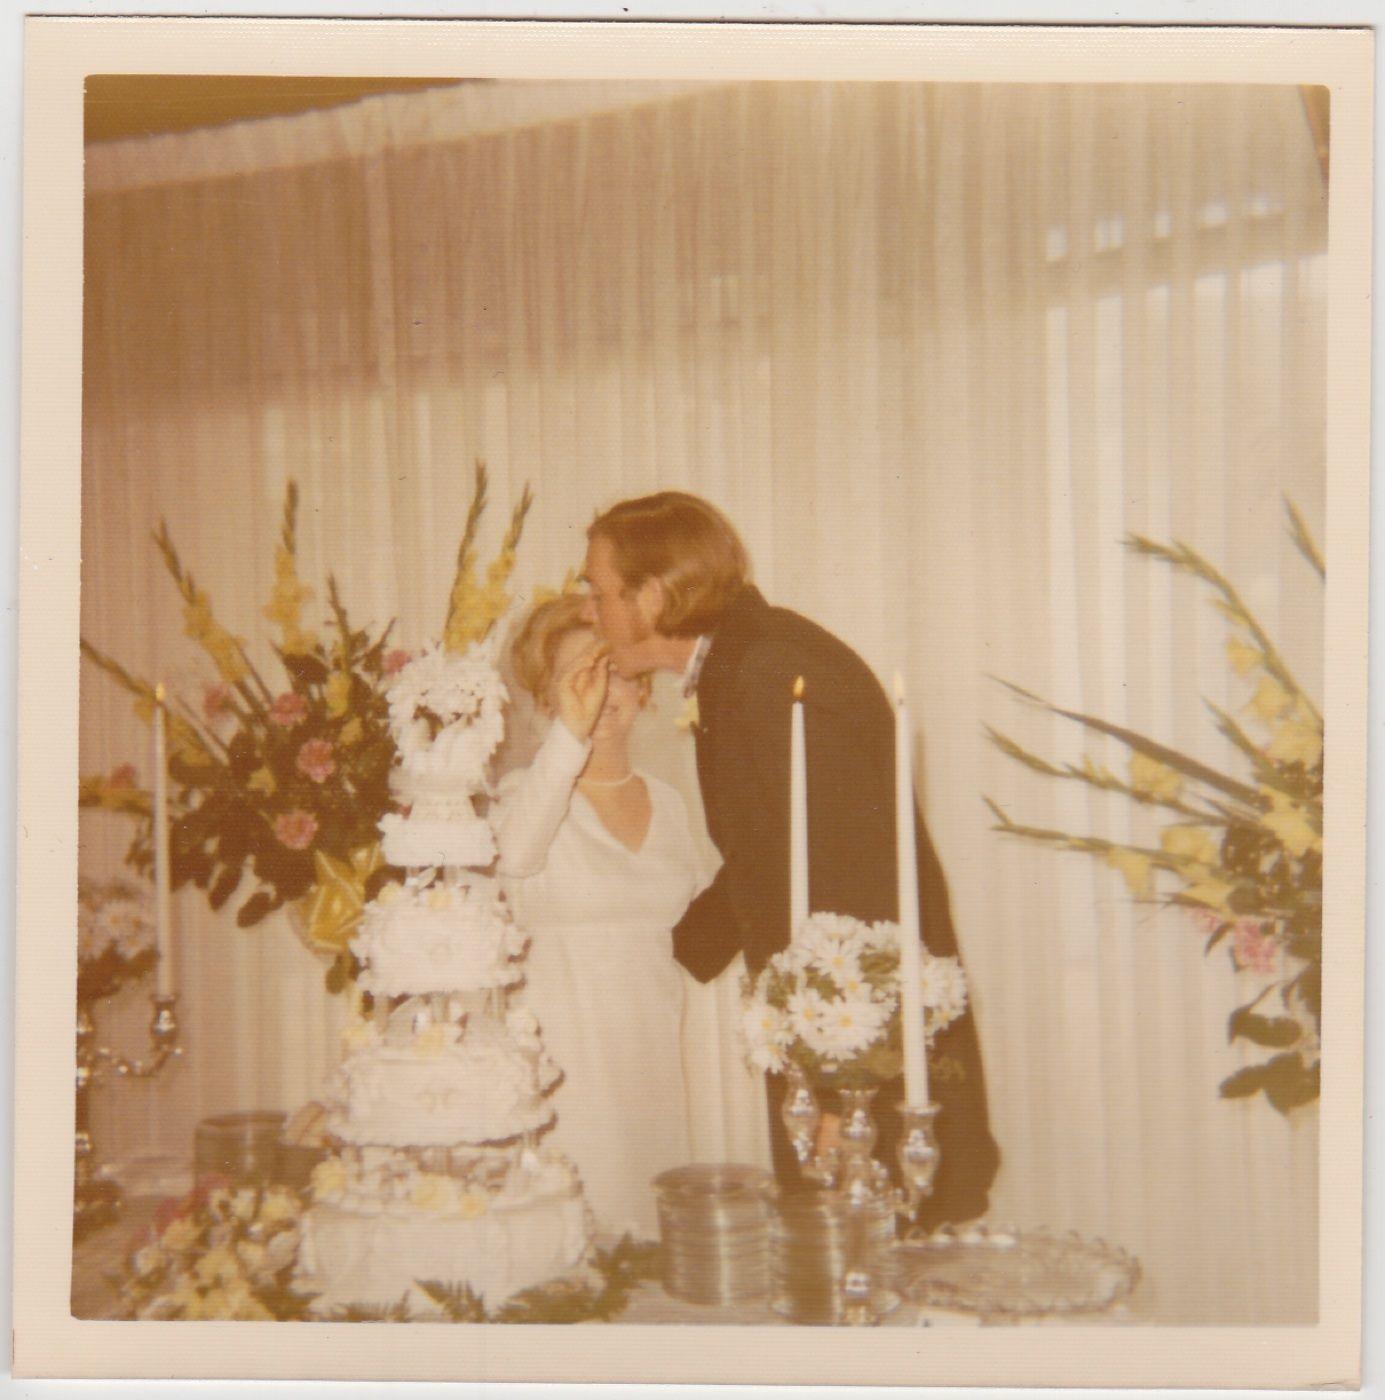 70 interesting vintage polaroid snaps of weddings in the